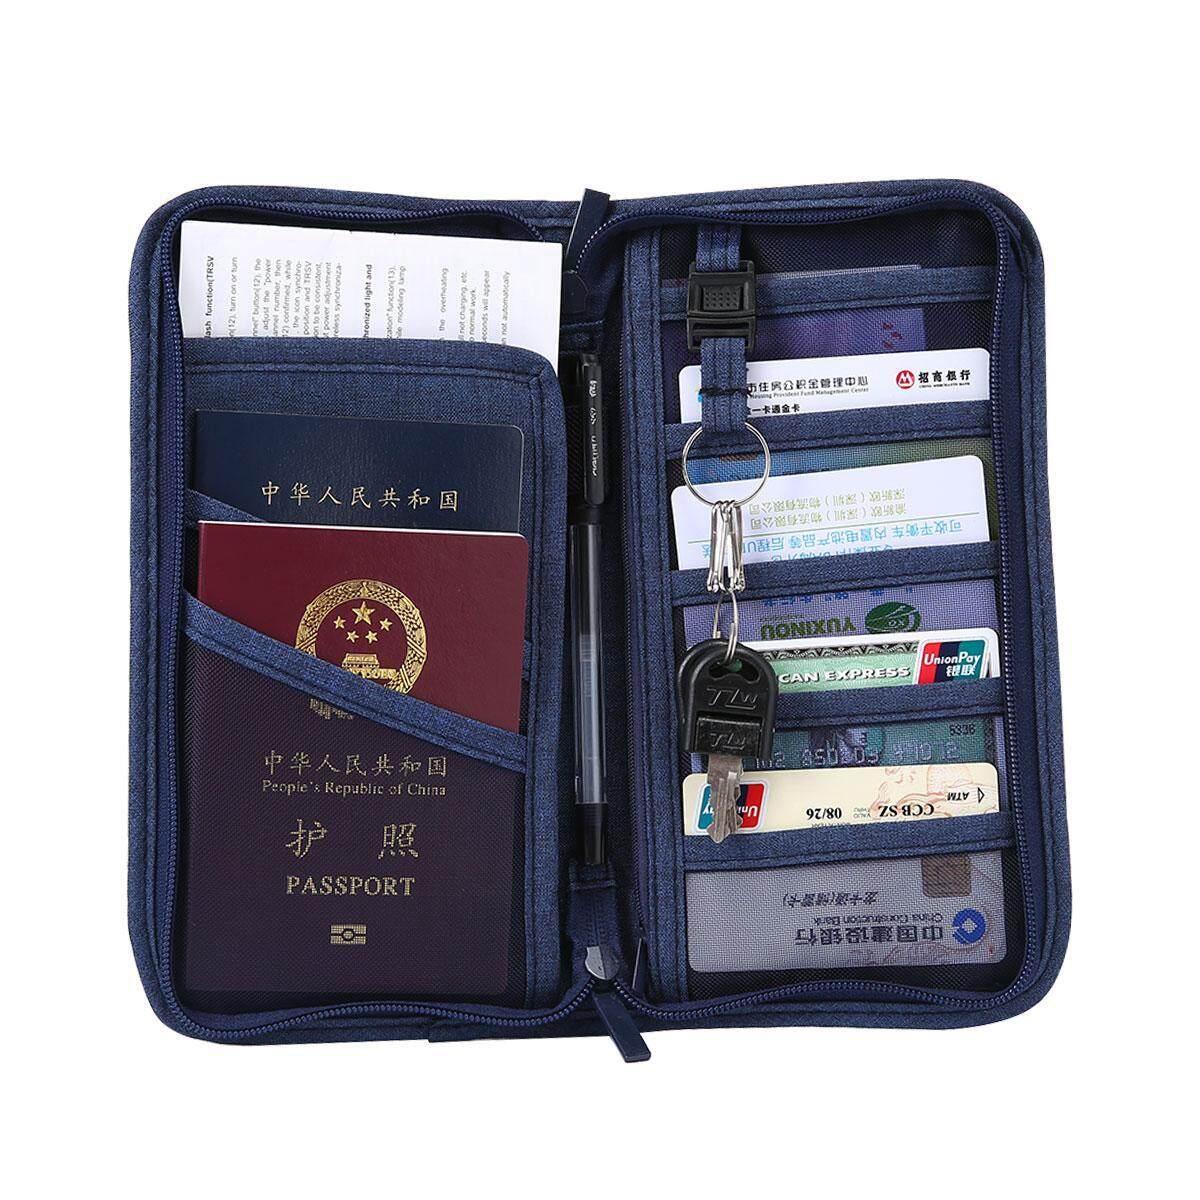 ed0d7a3dc64 efuture Travel Wallet Multi-functional Passport Holder Travel Card  Organiser Pouch Storage Bag For Smart